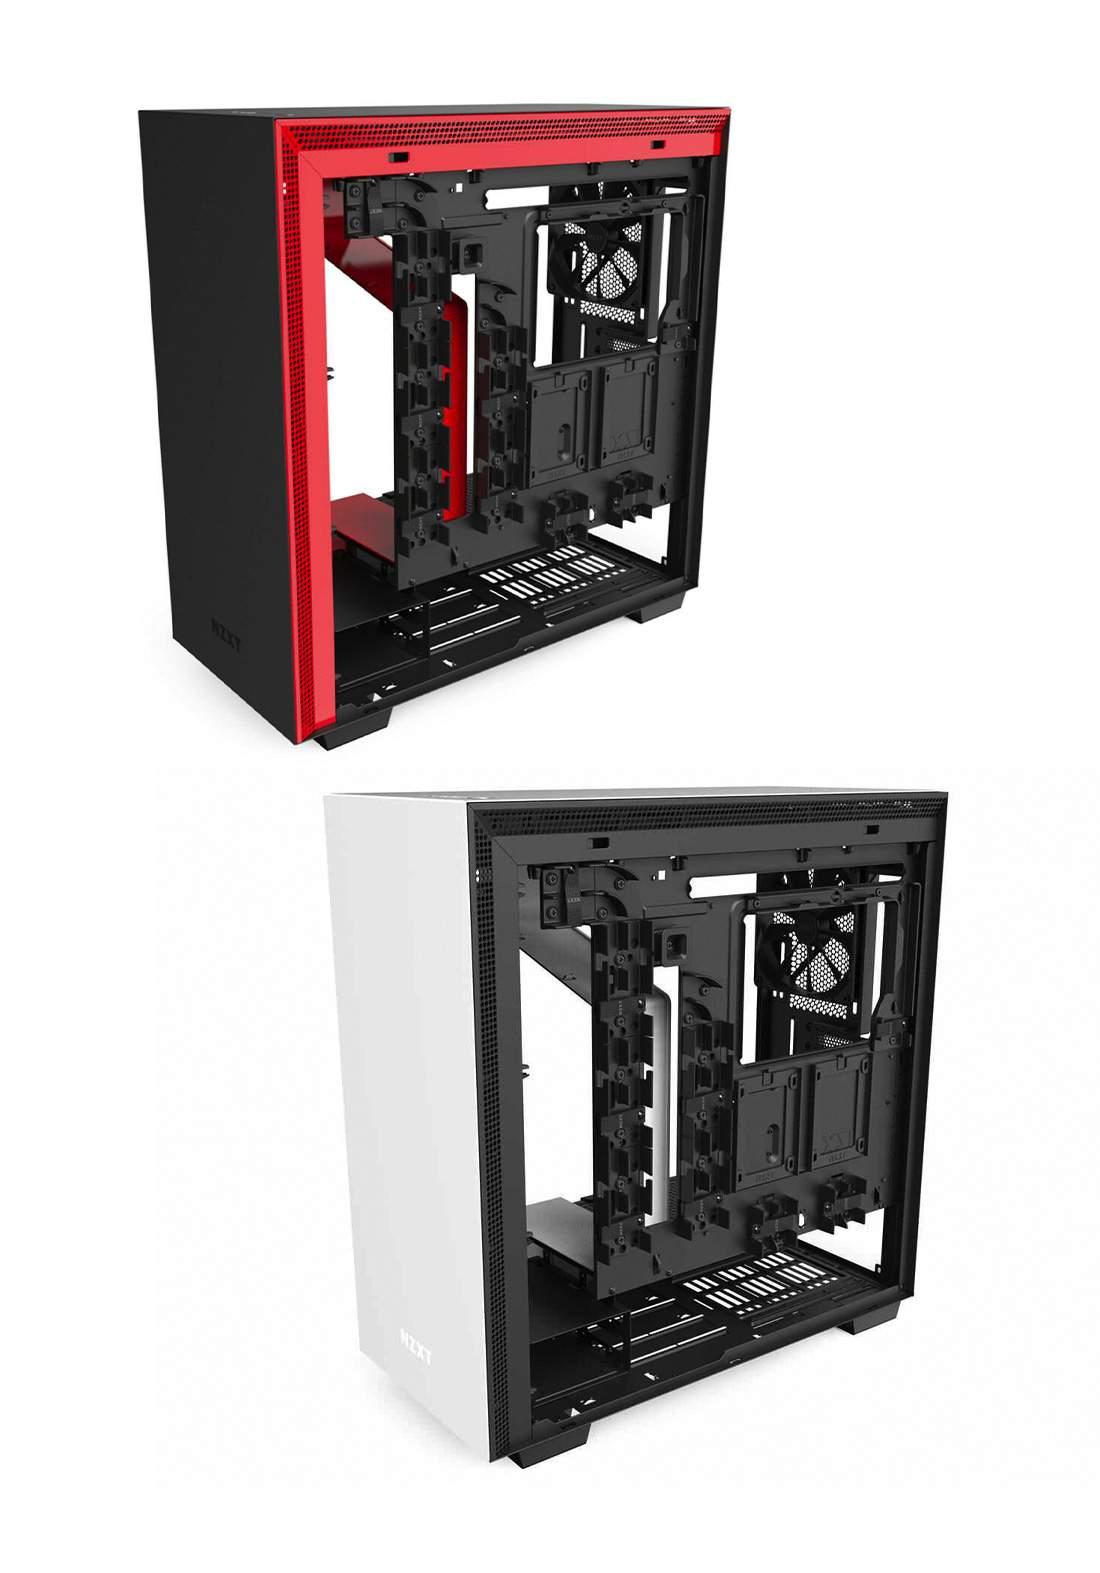 Nzxt H710 Atx Mid Tower Case كيس حاسبة